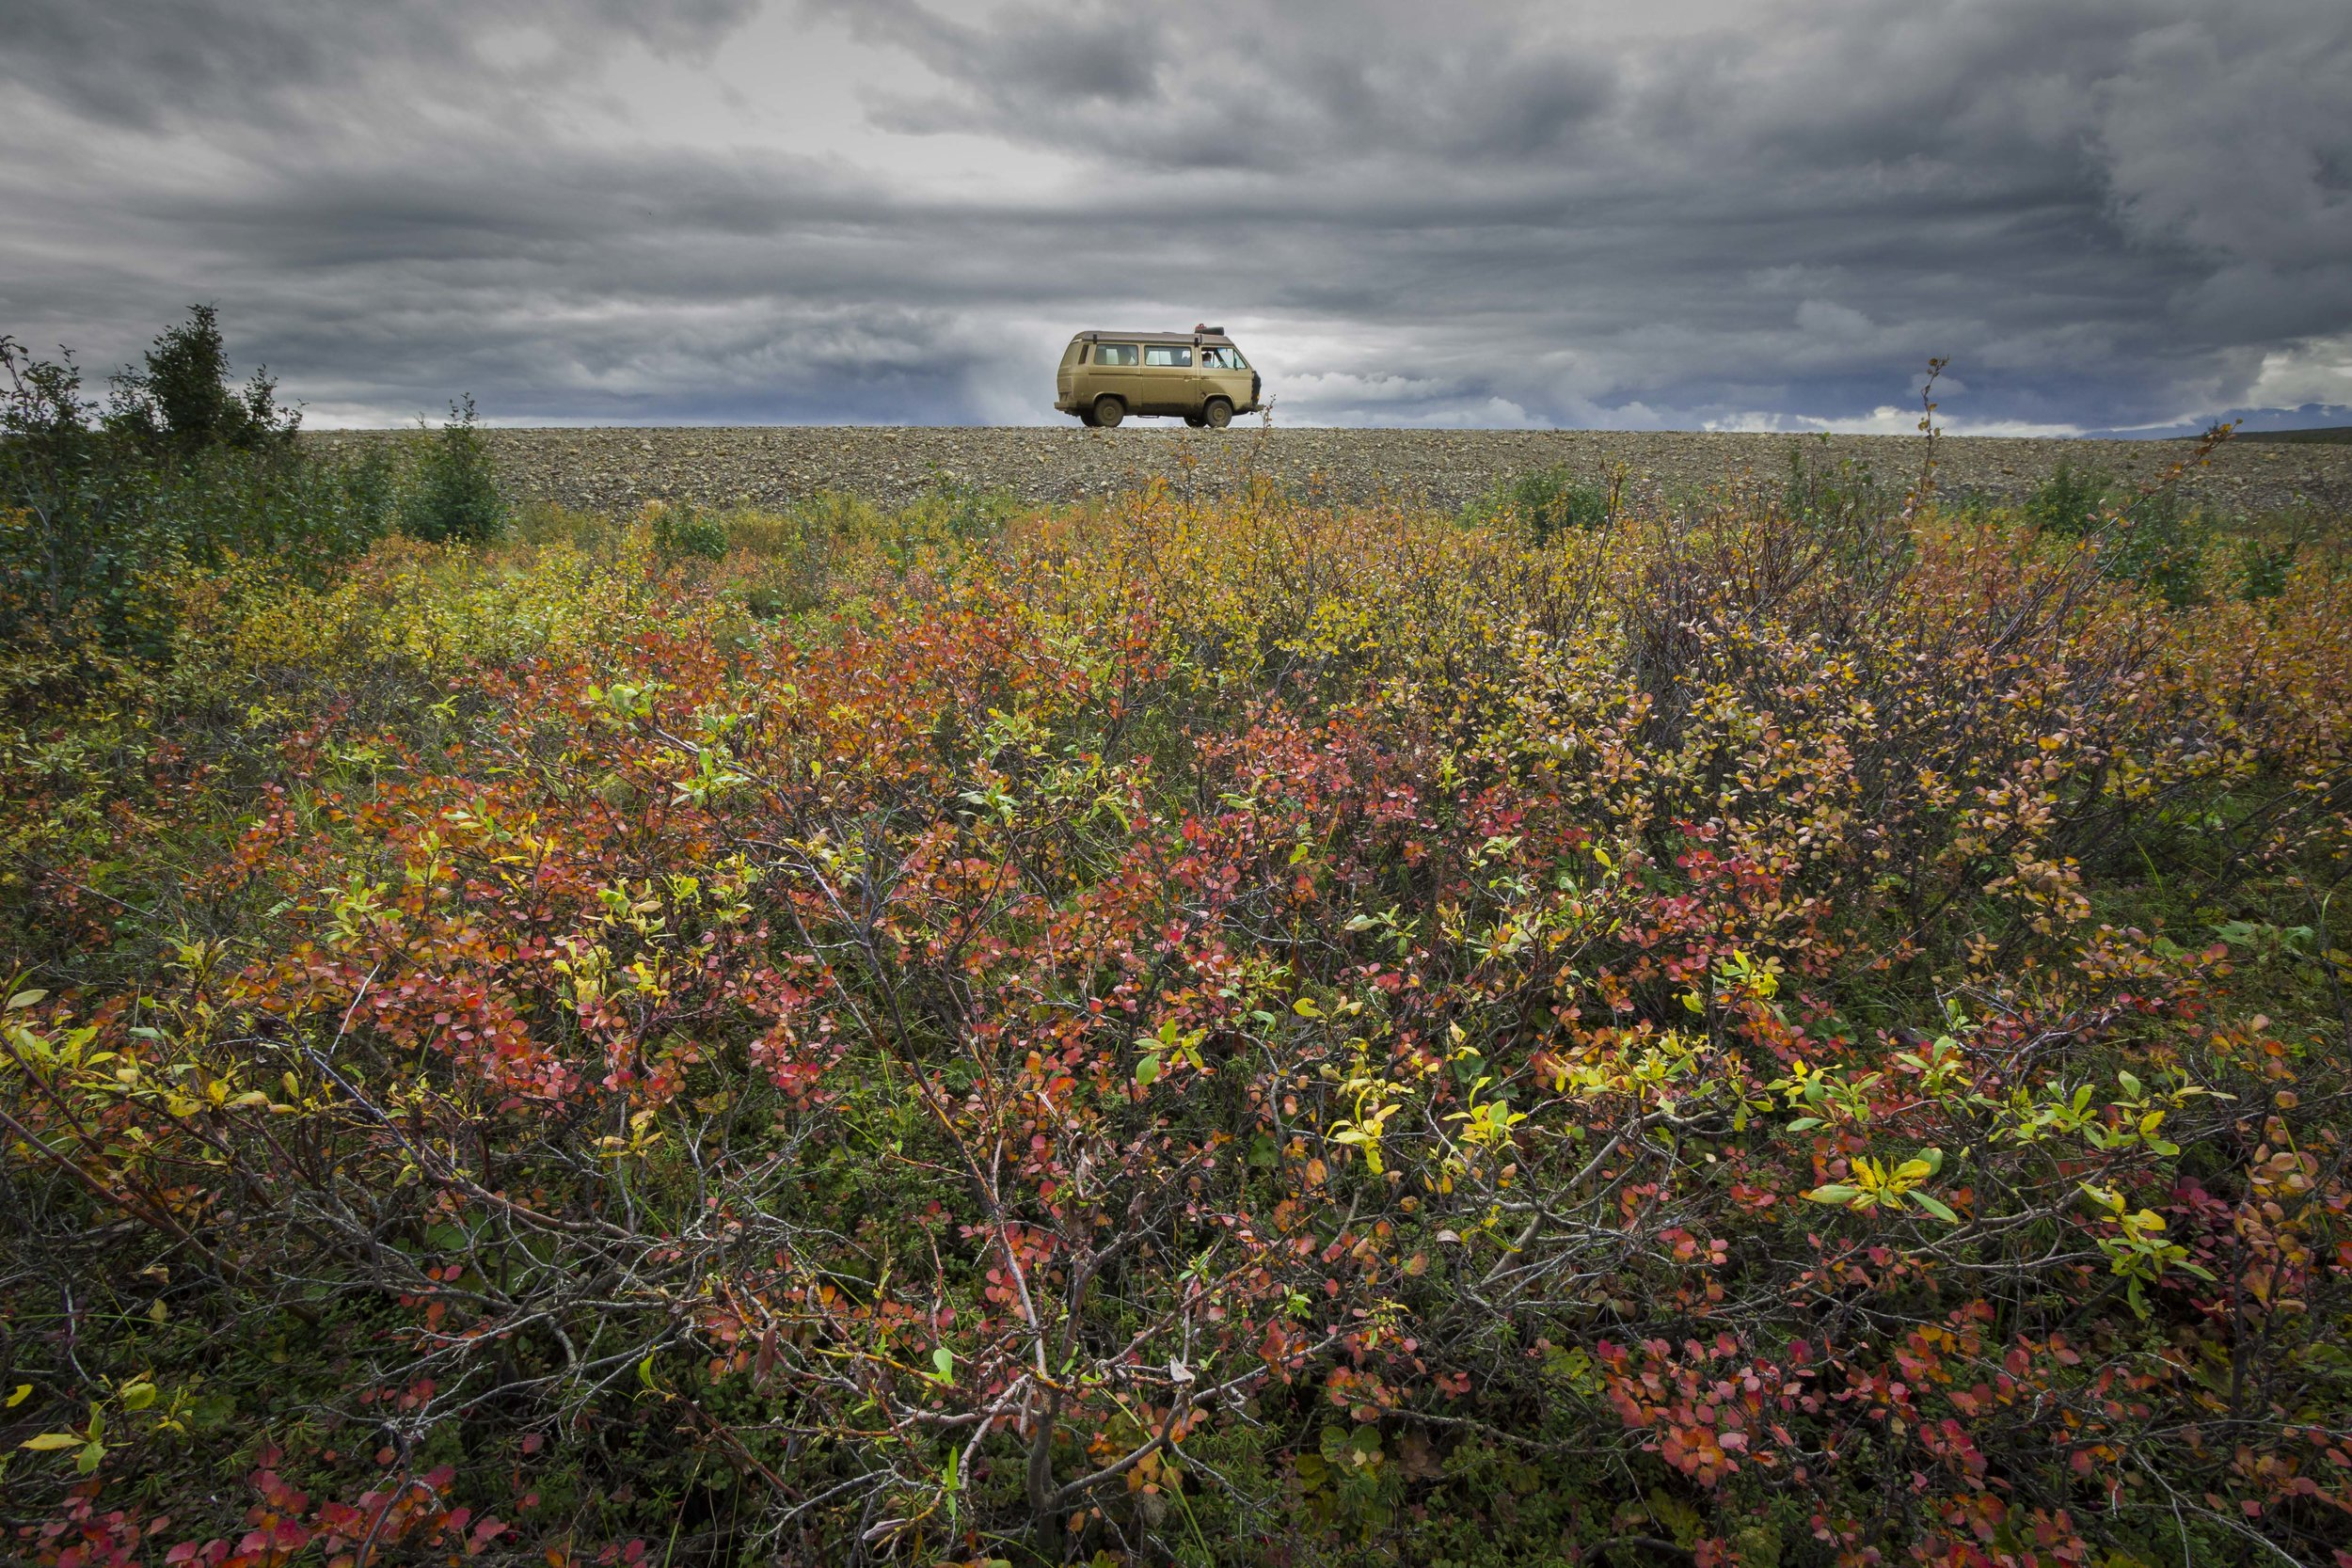 Dempster Highway, Roadtrip, Landscape, Arctic, rob gubiani, Tundra, Tombstone, Tuktoyuktuk, Inuvik, Dempster, Yukon, travel, wanderlust, bus, volkswagen, westfalia, camper van